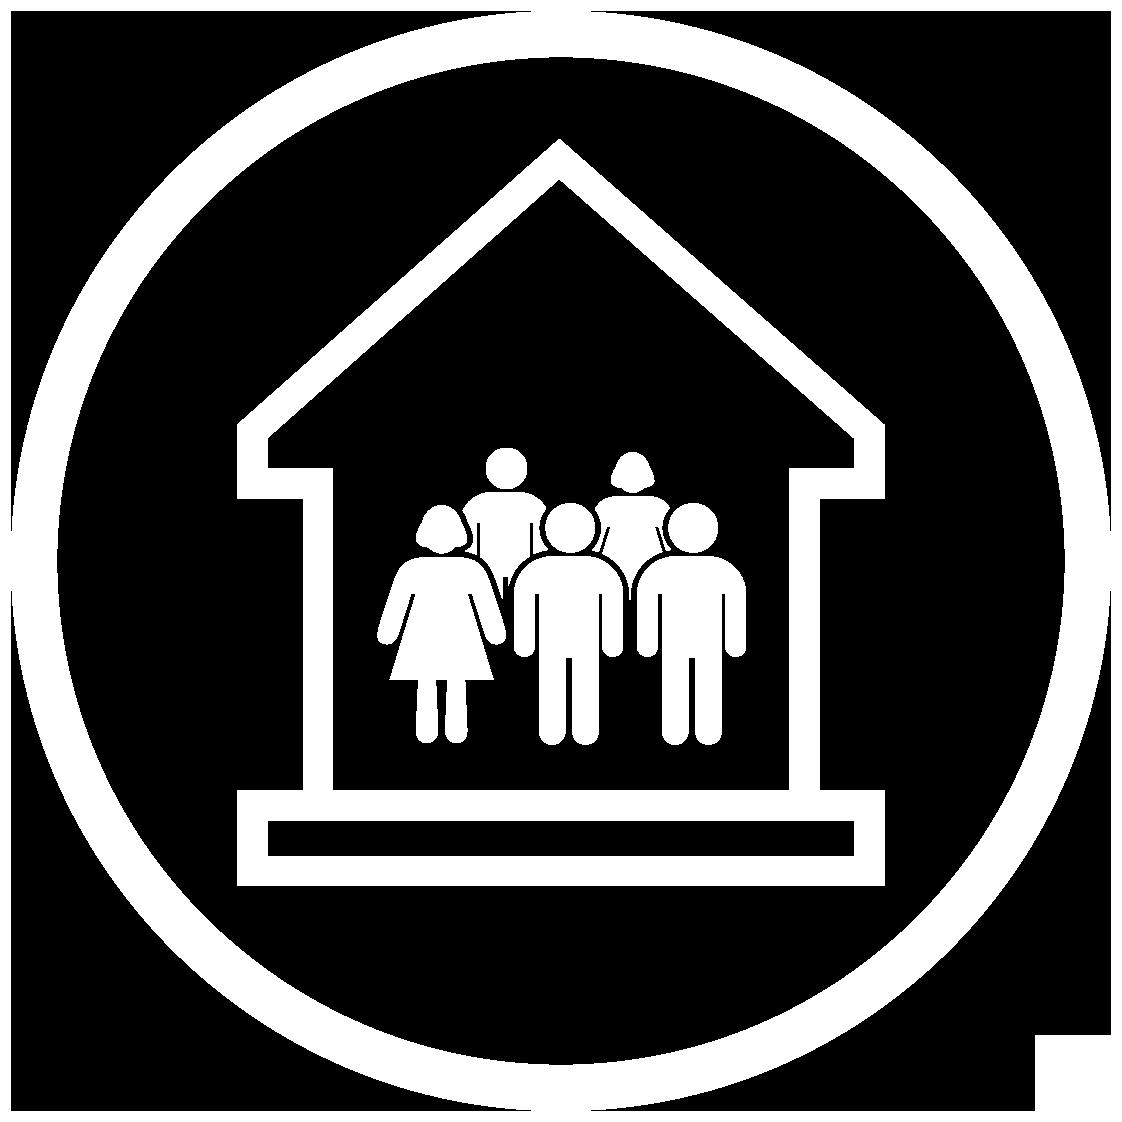 Demandeurs d'asile Coallia